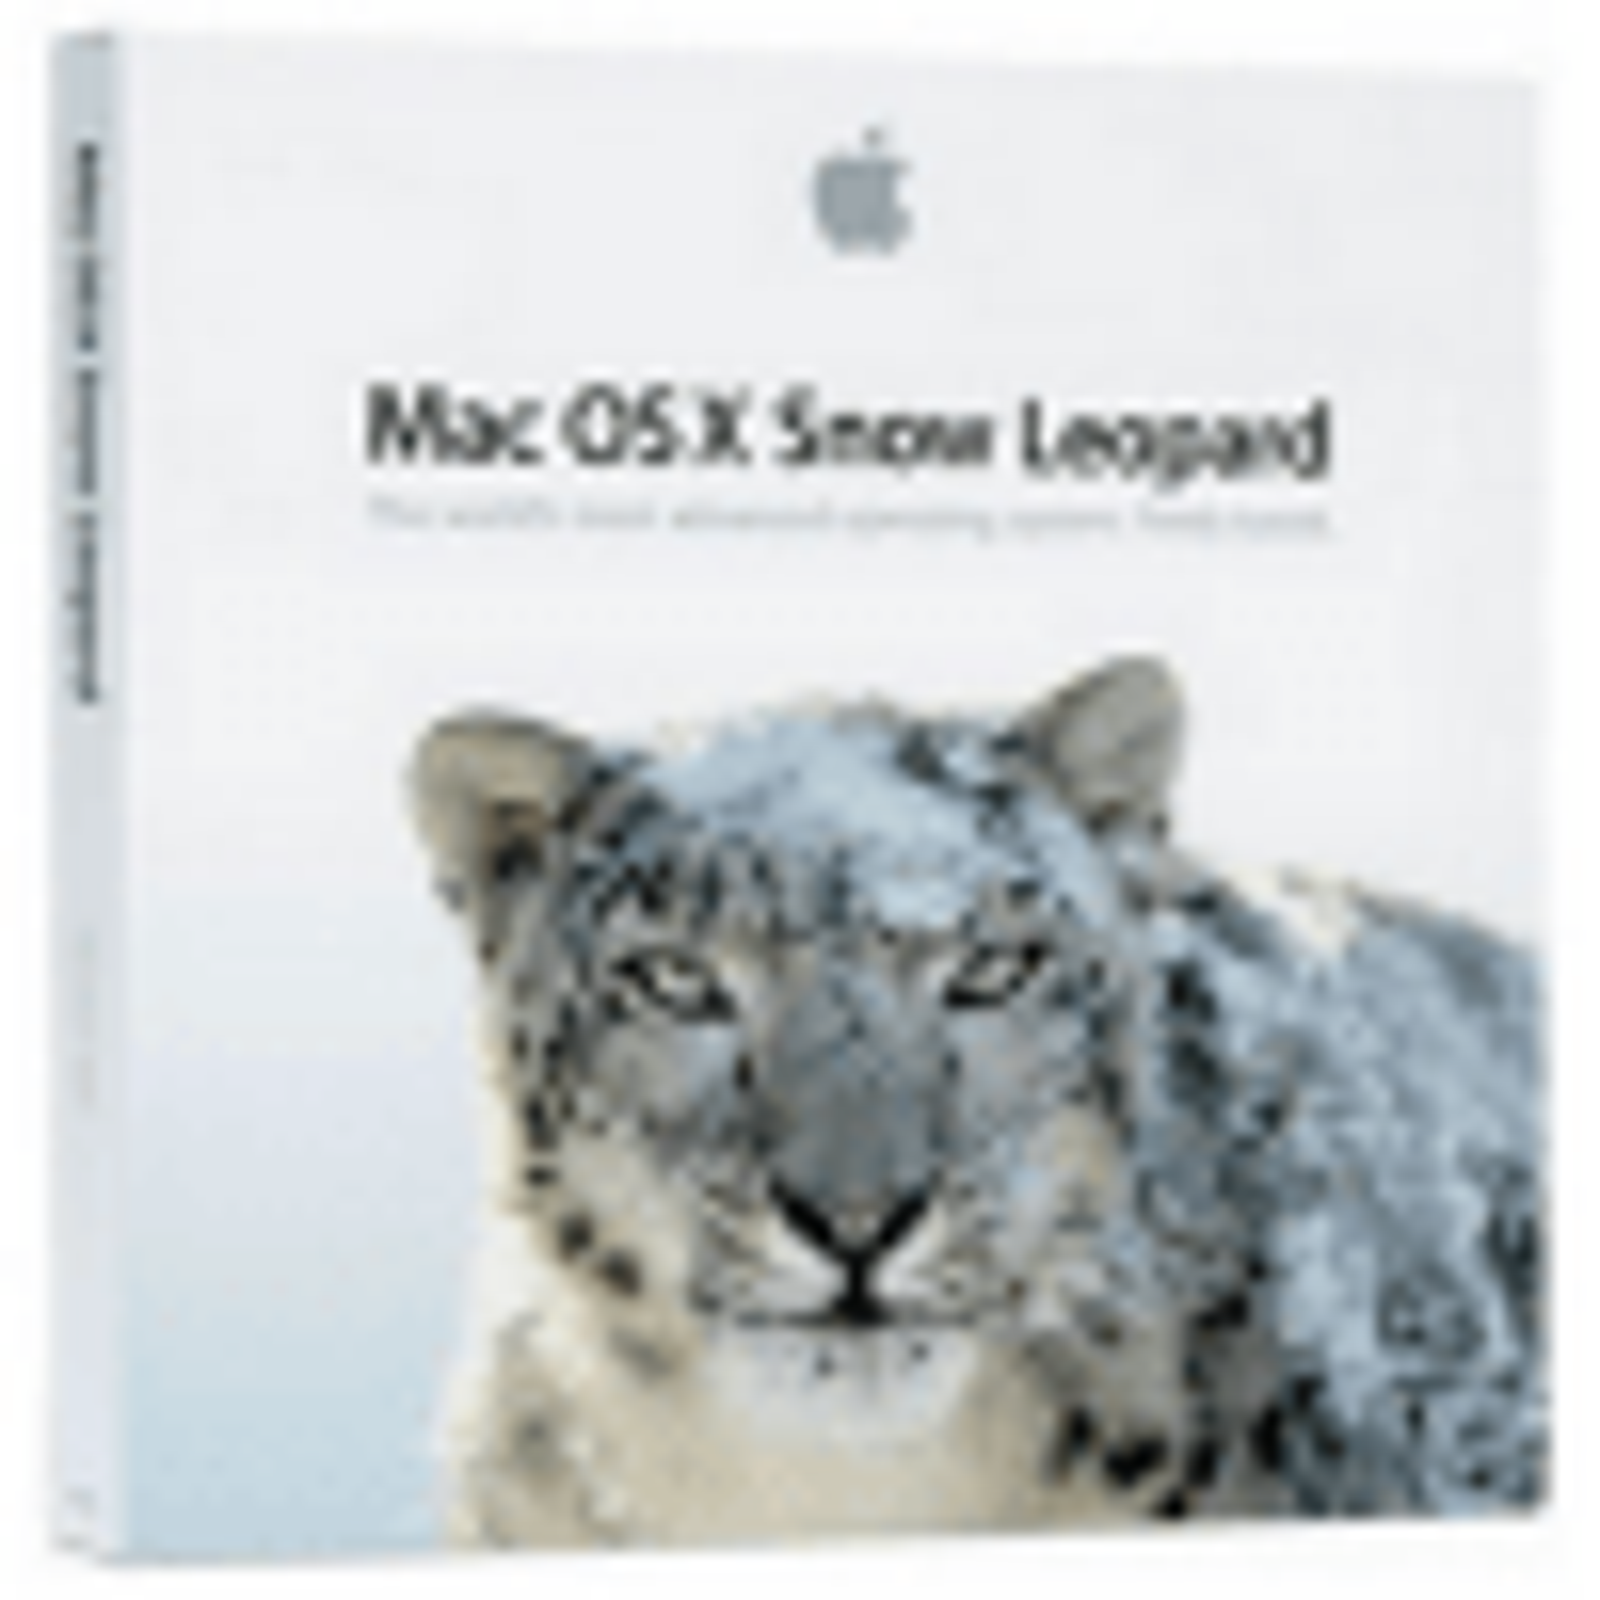 Mac OS X 10.6 Snow Leopard 10.6